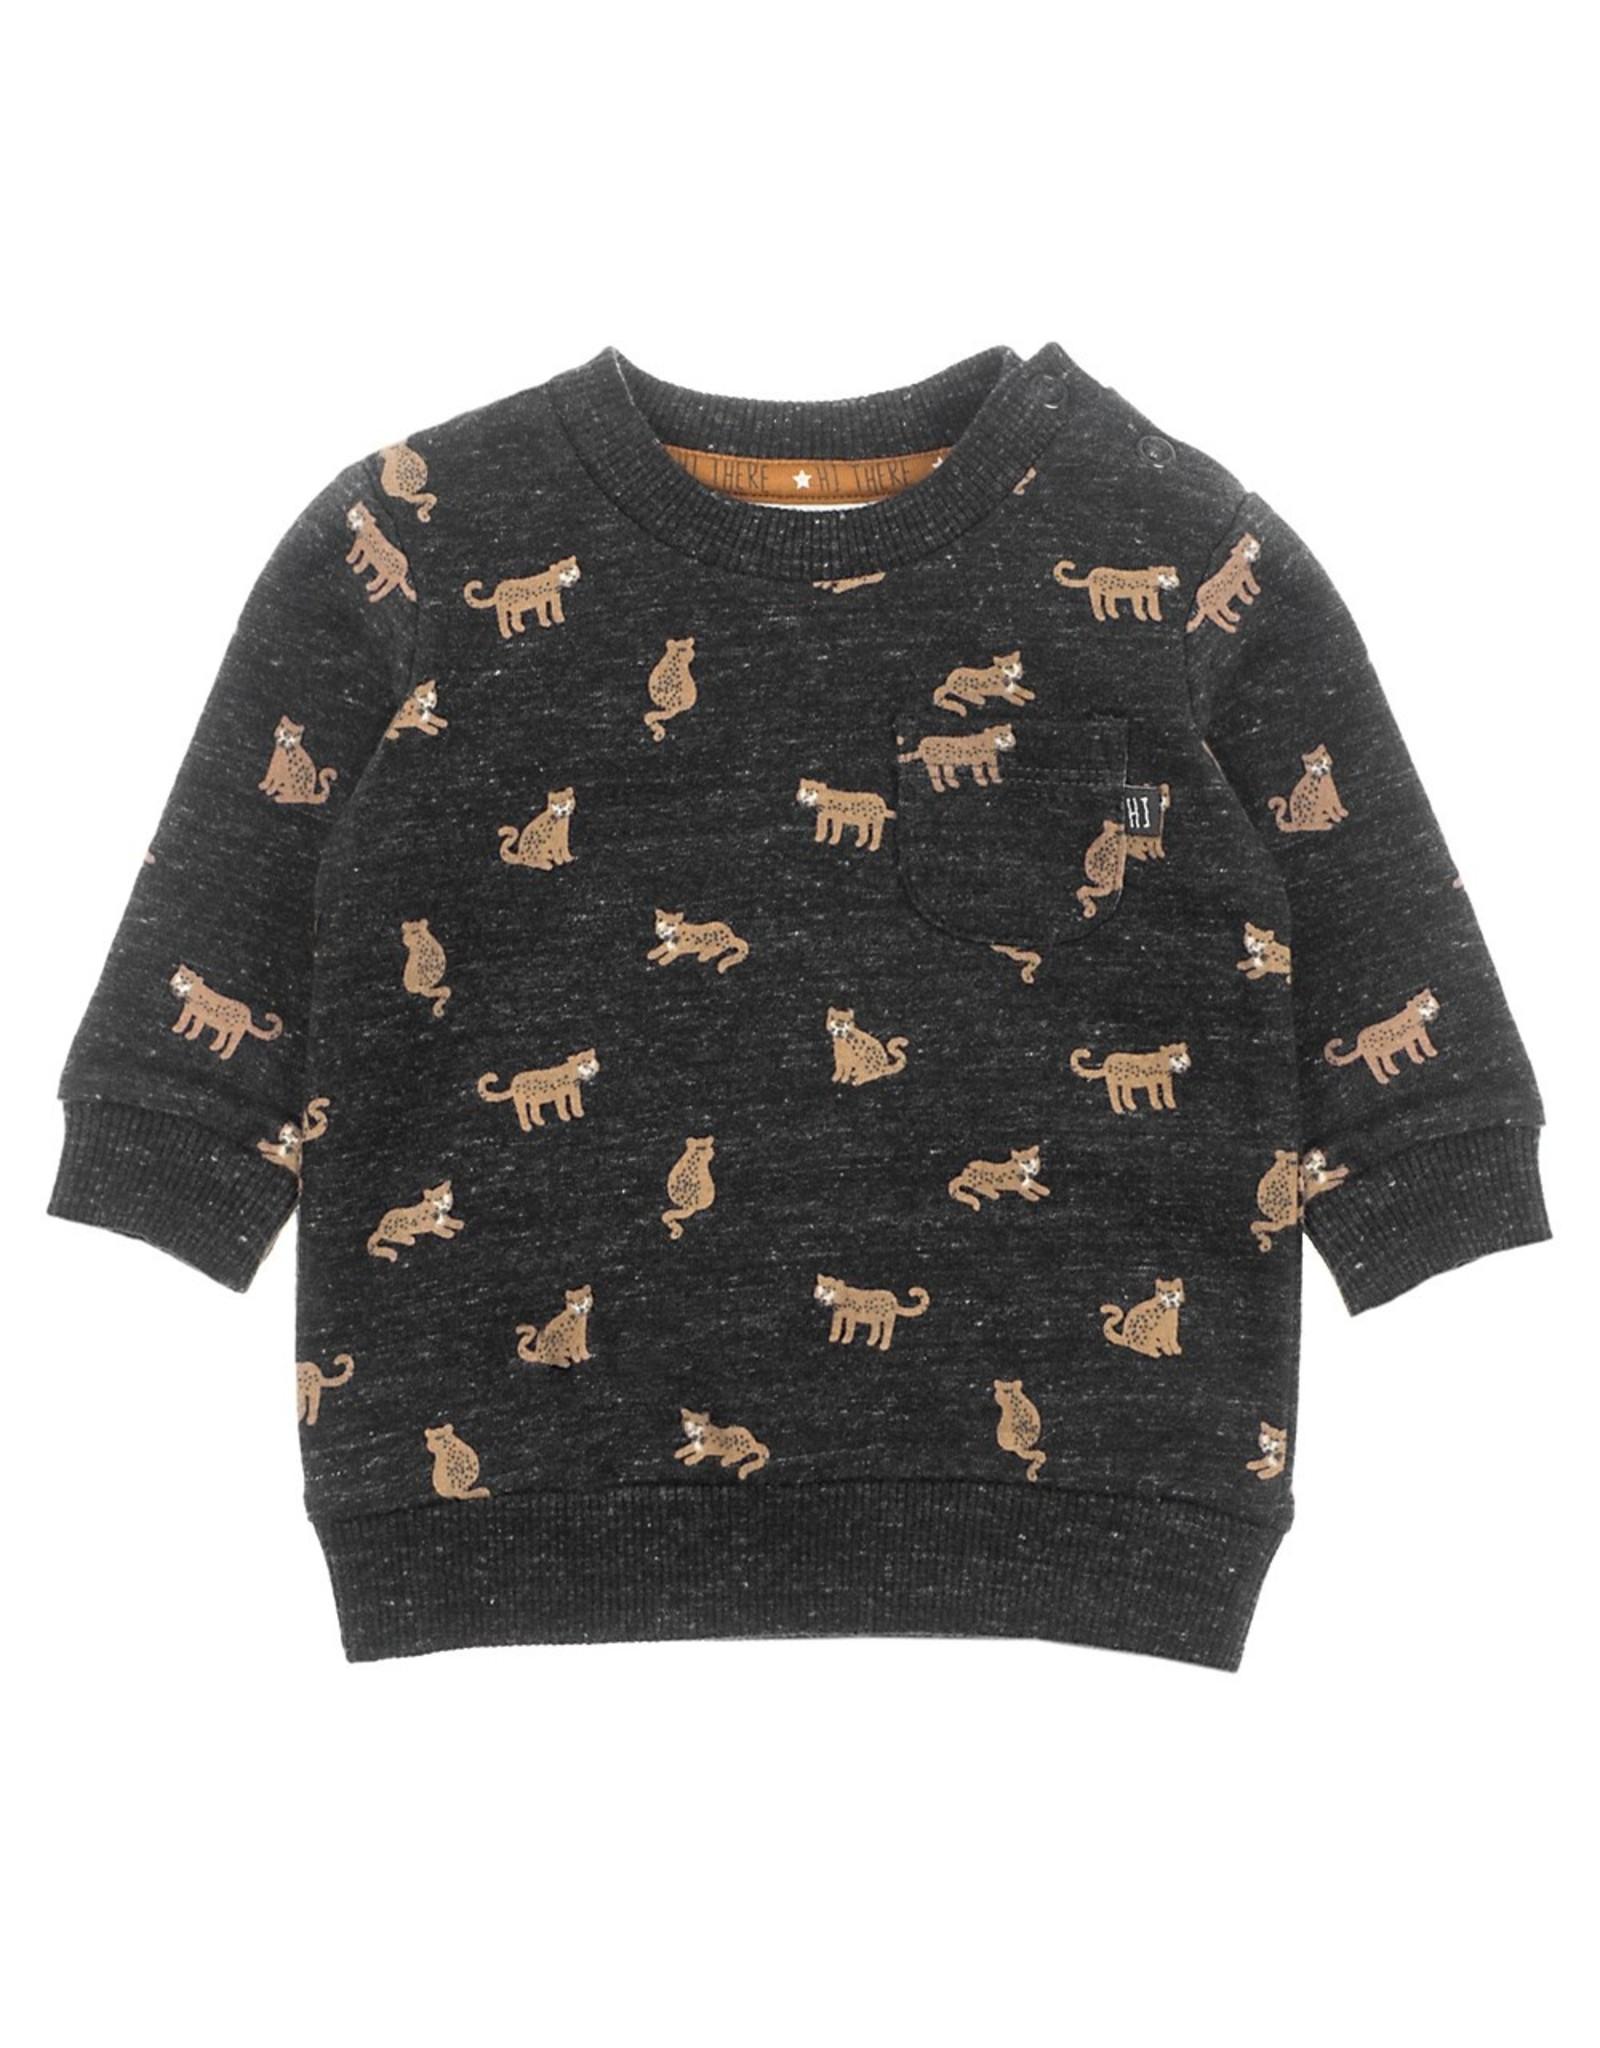 Feetje Sweater AOP - Hi There maat 56